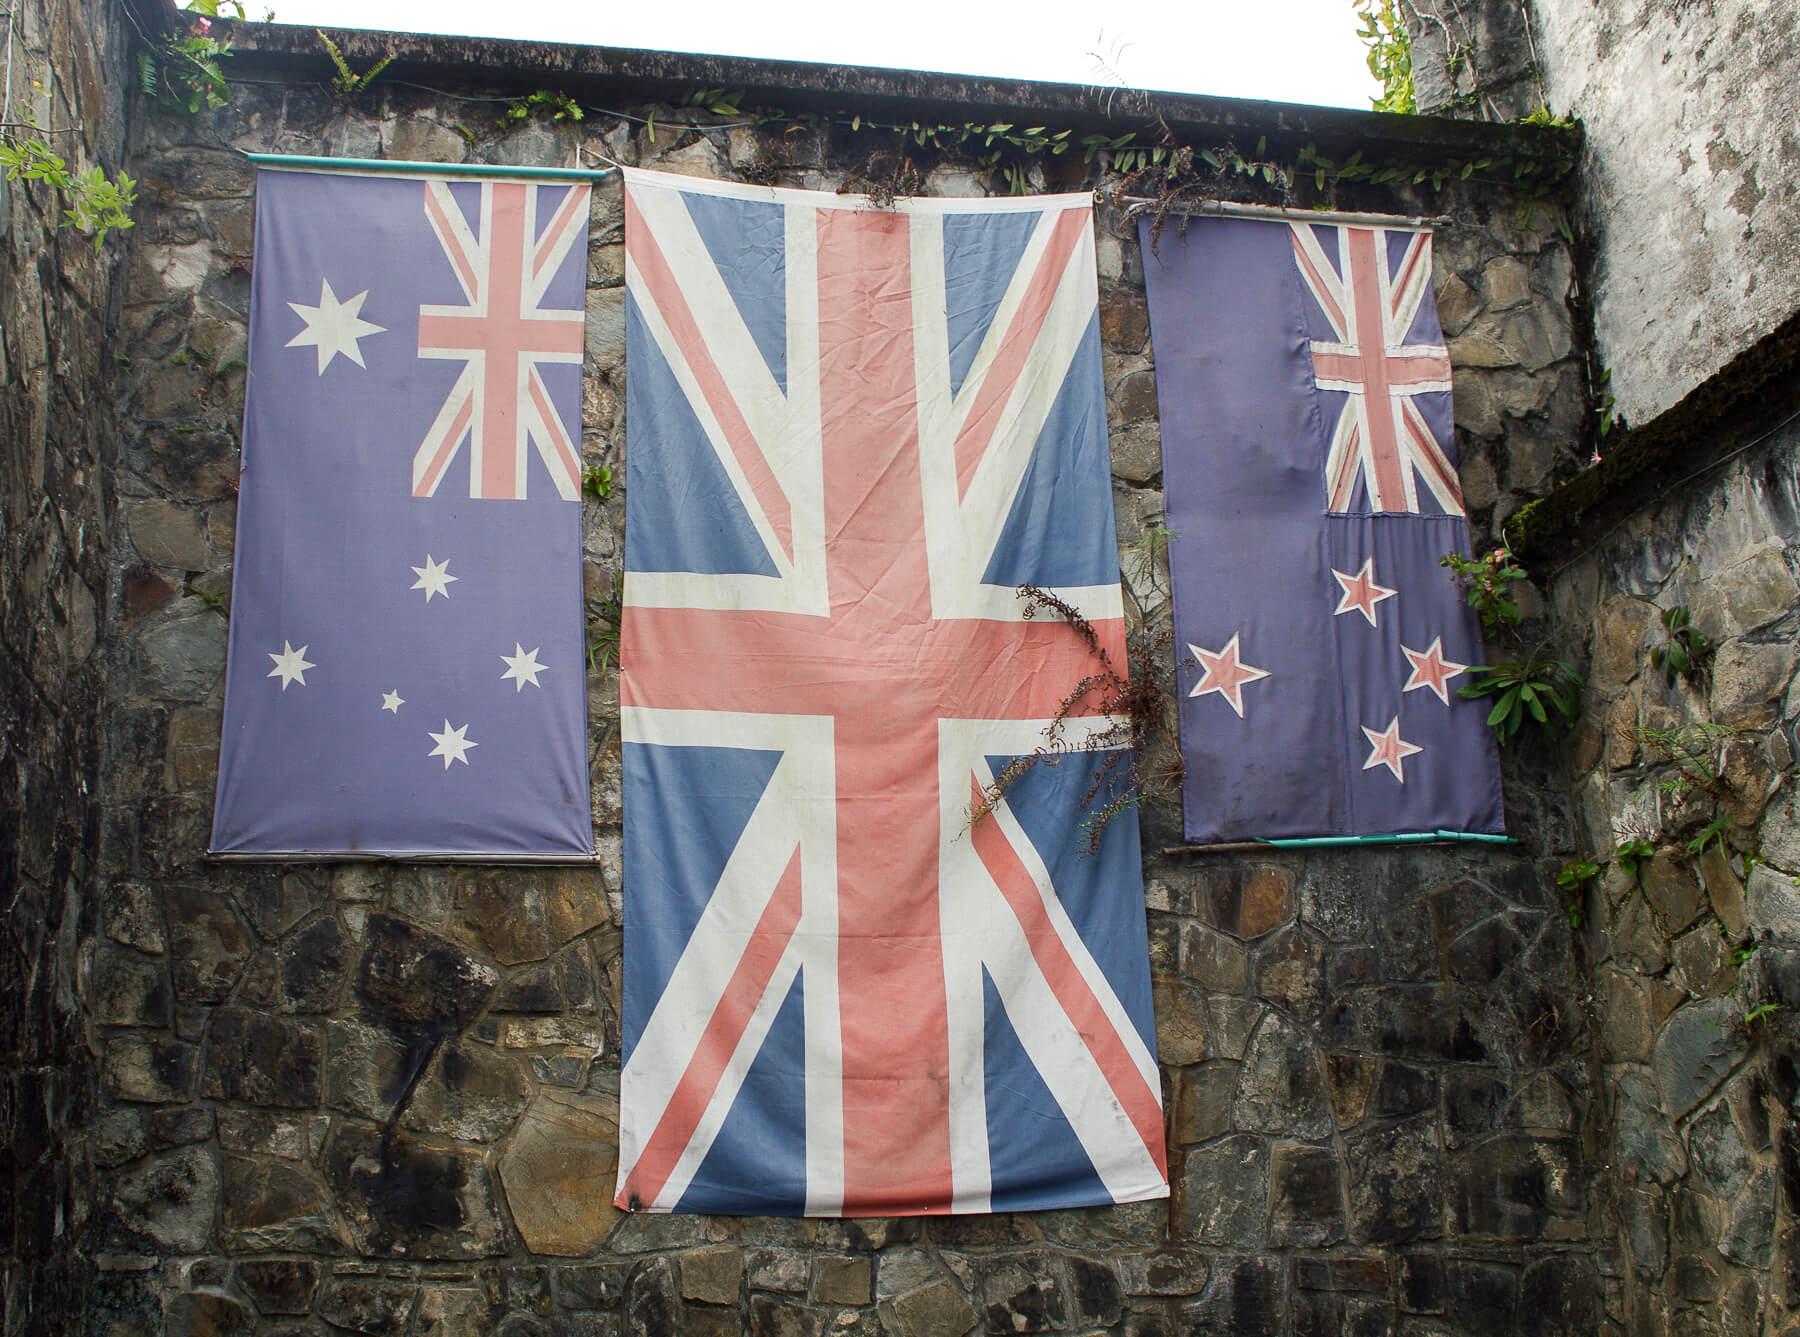 Australian, UK and NZ flags at war memorial in Borneo